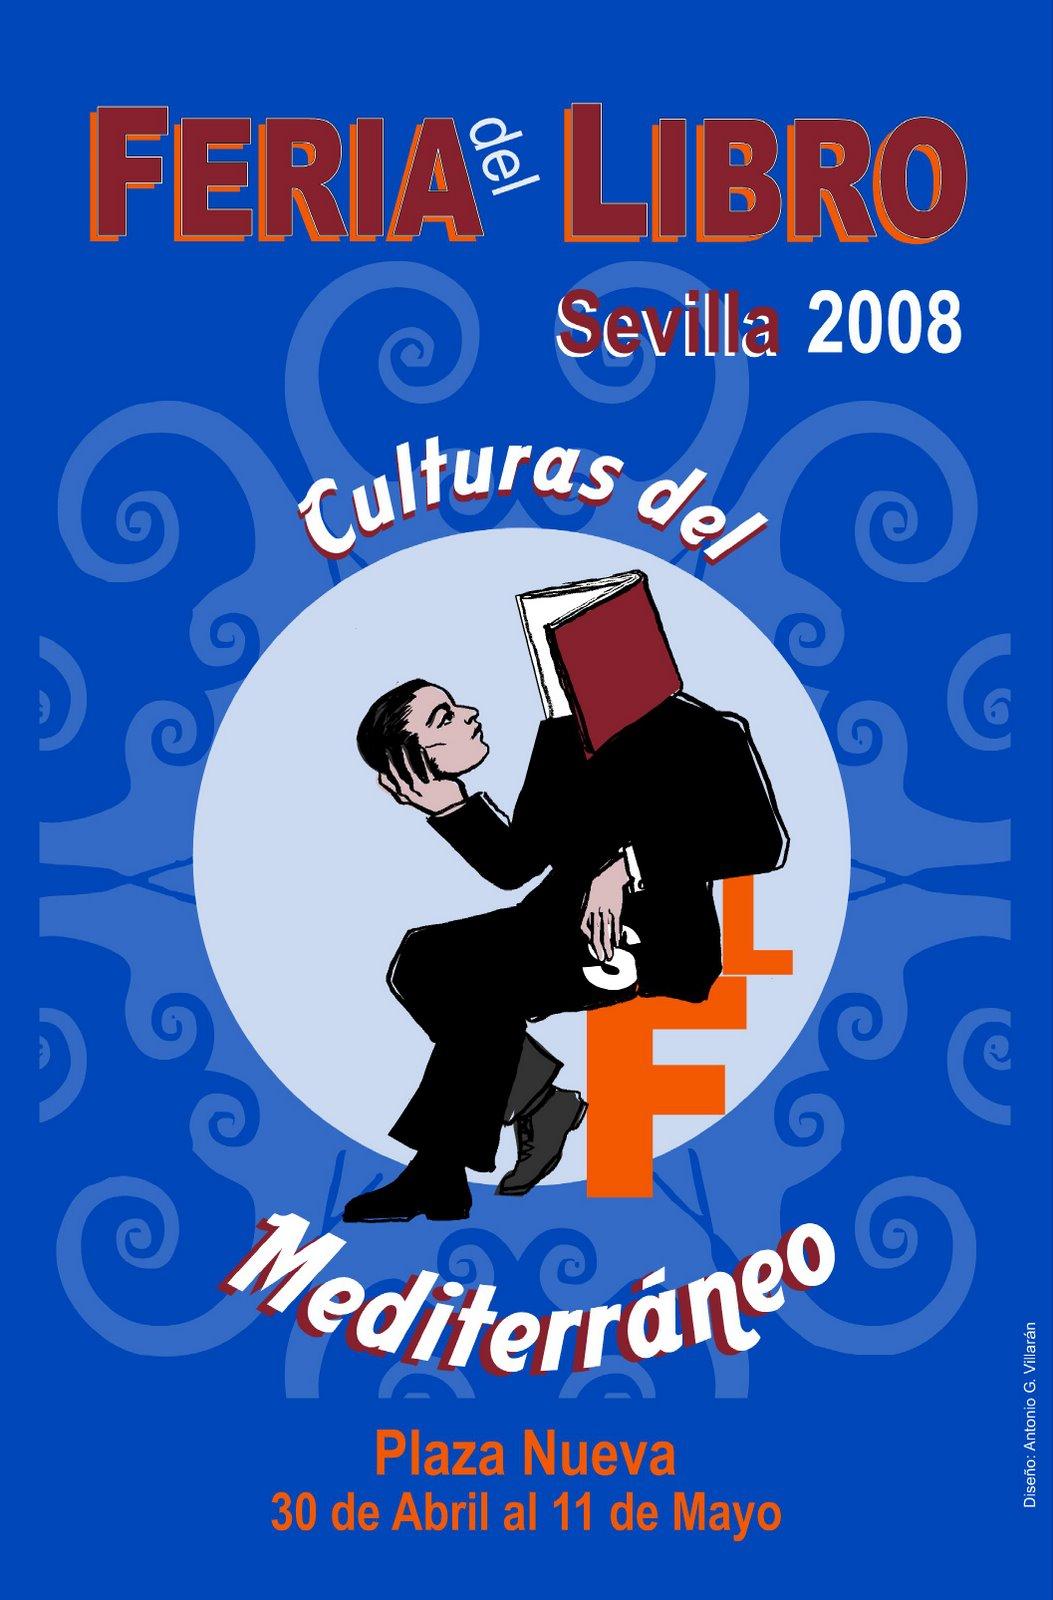 [feria+libro+FLS+08.jpg]